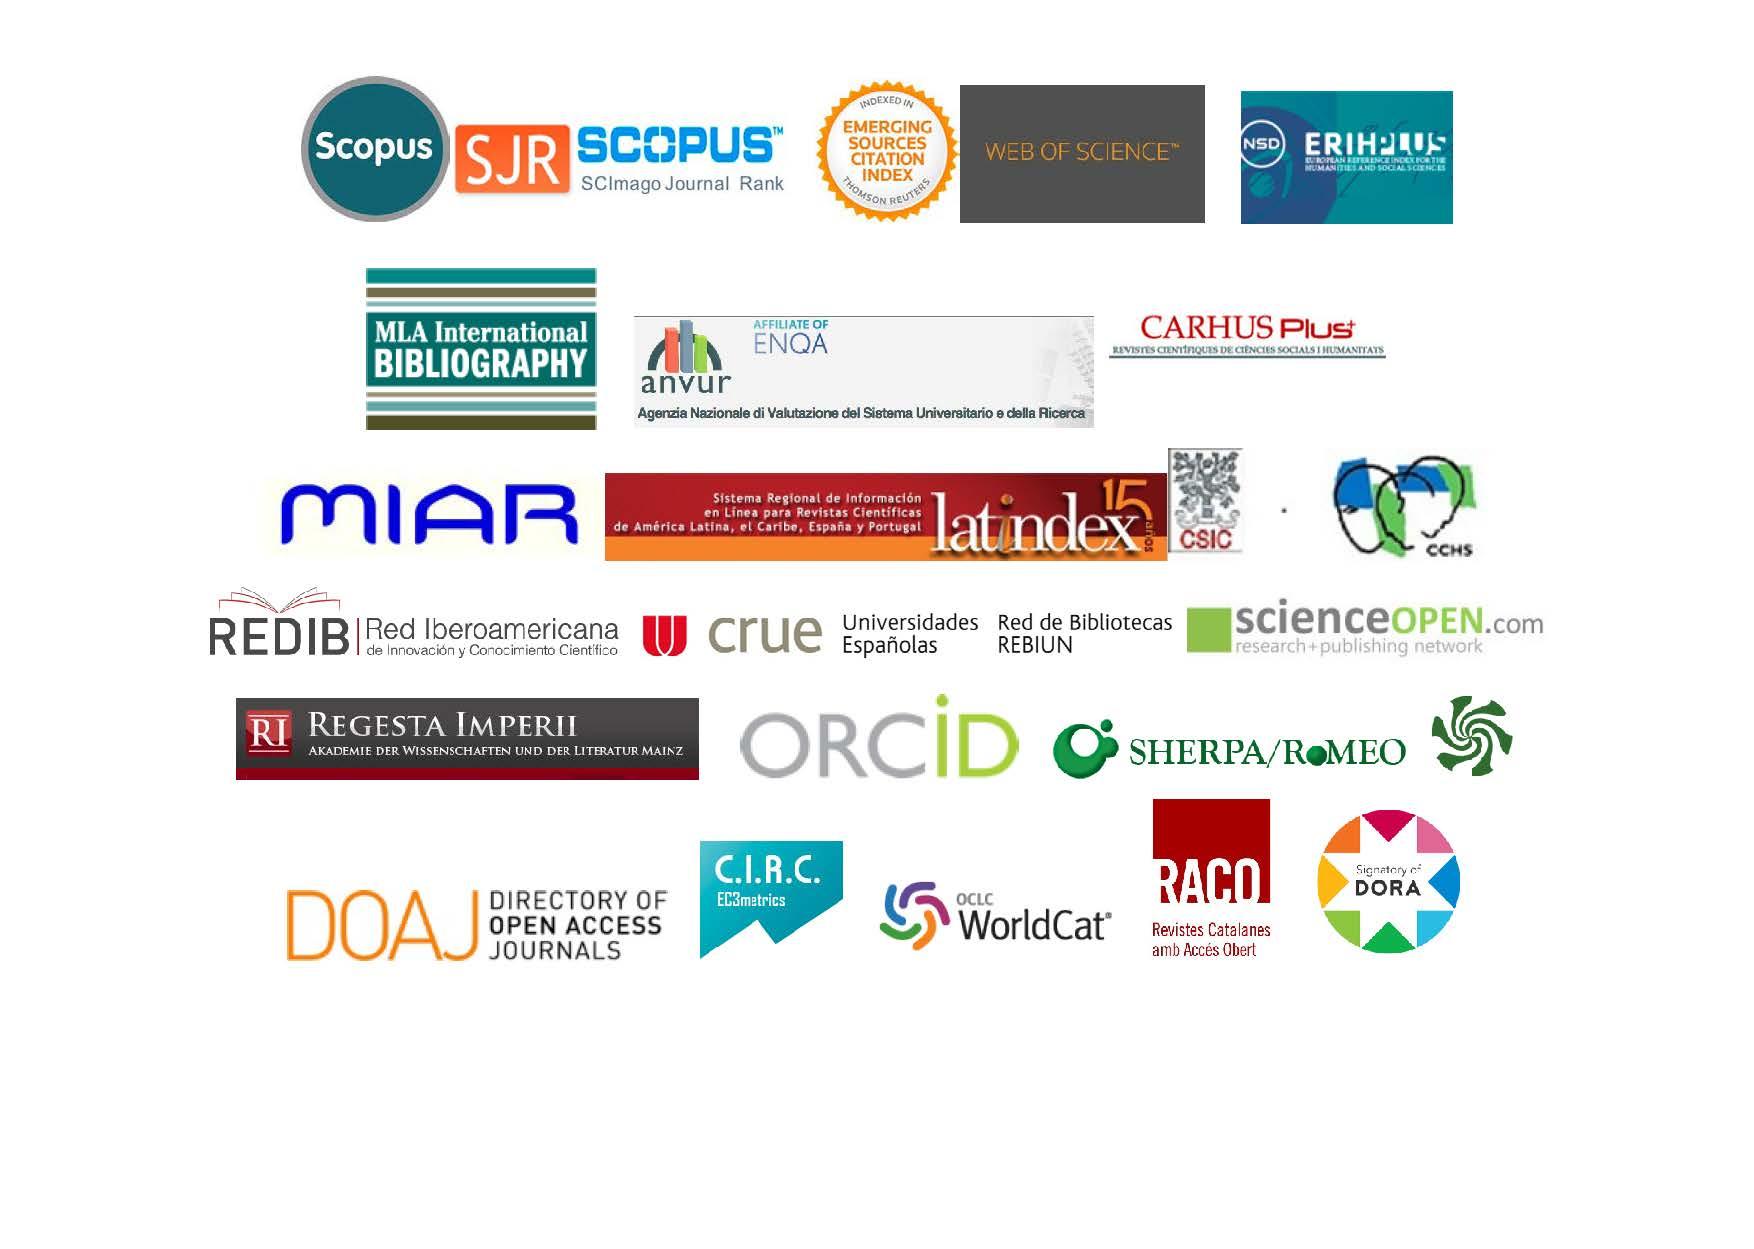 https://www.uv.es/mclm/logosindexs.jpg